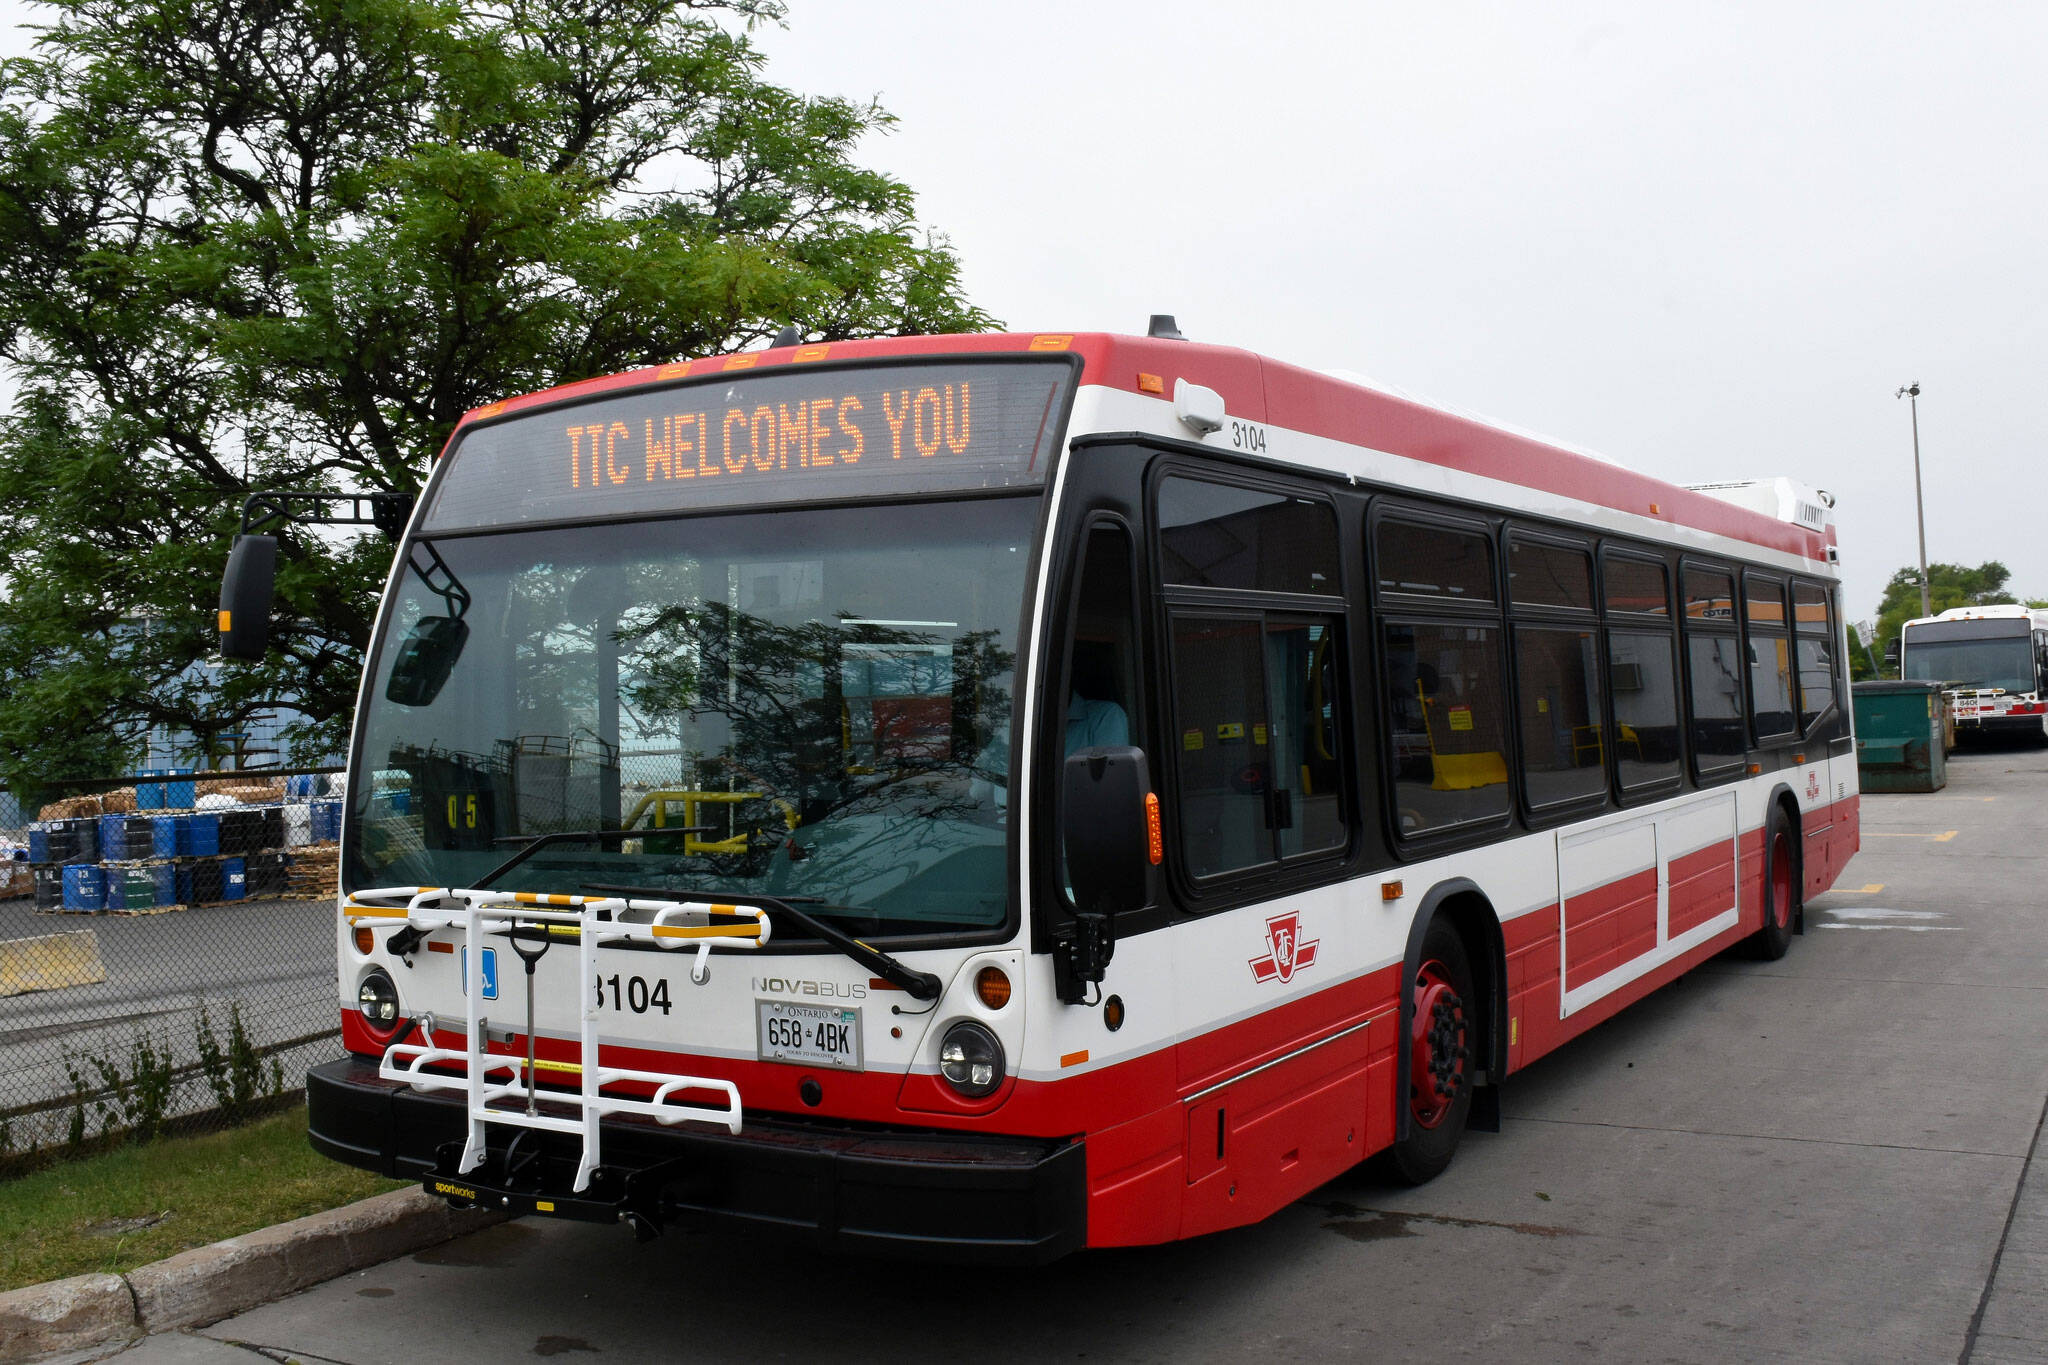 ttc usb bus